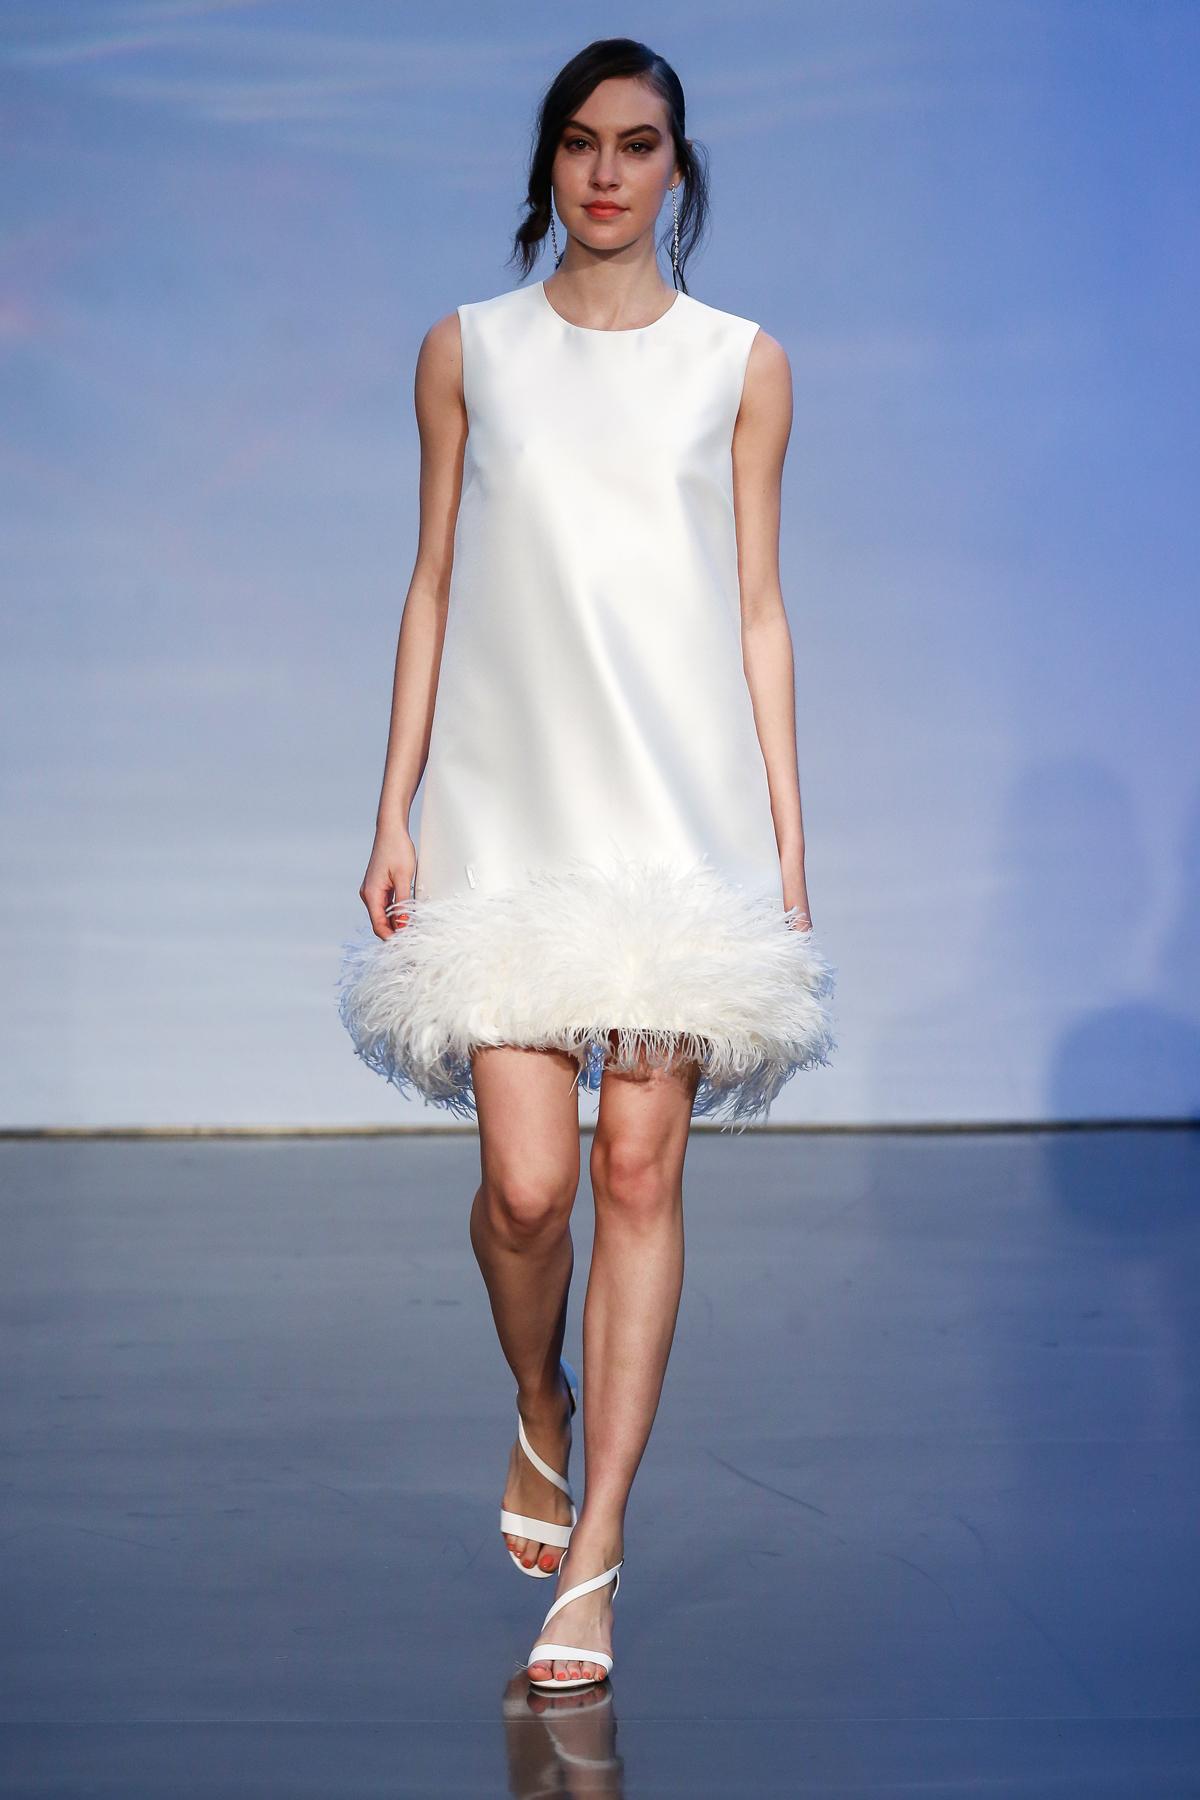 justin alexander signature fall 2019 short high neckline dress with feather hemline